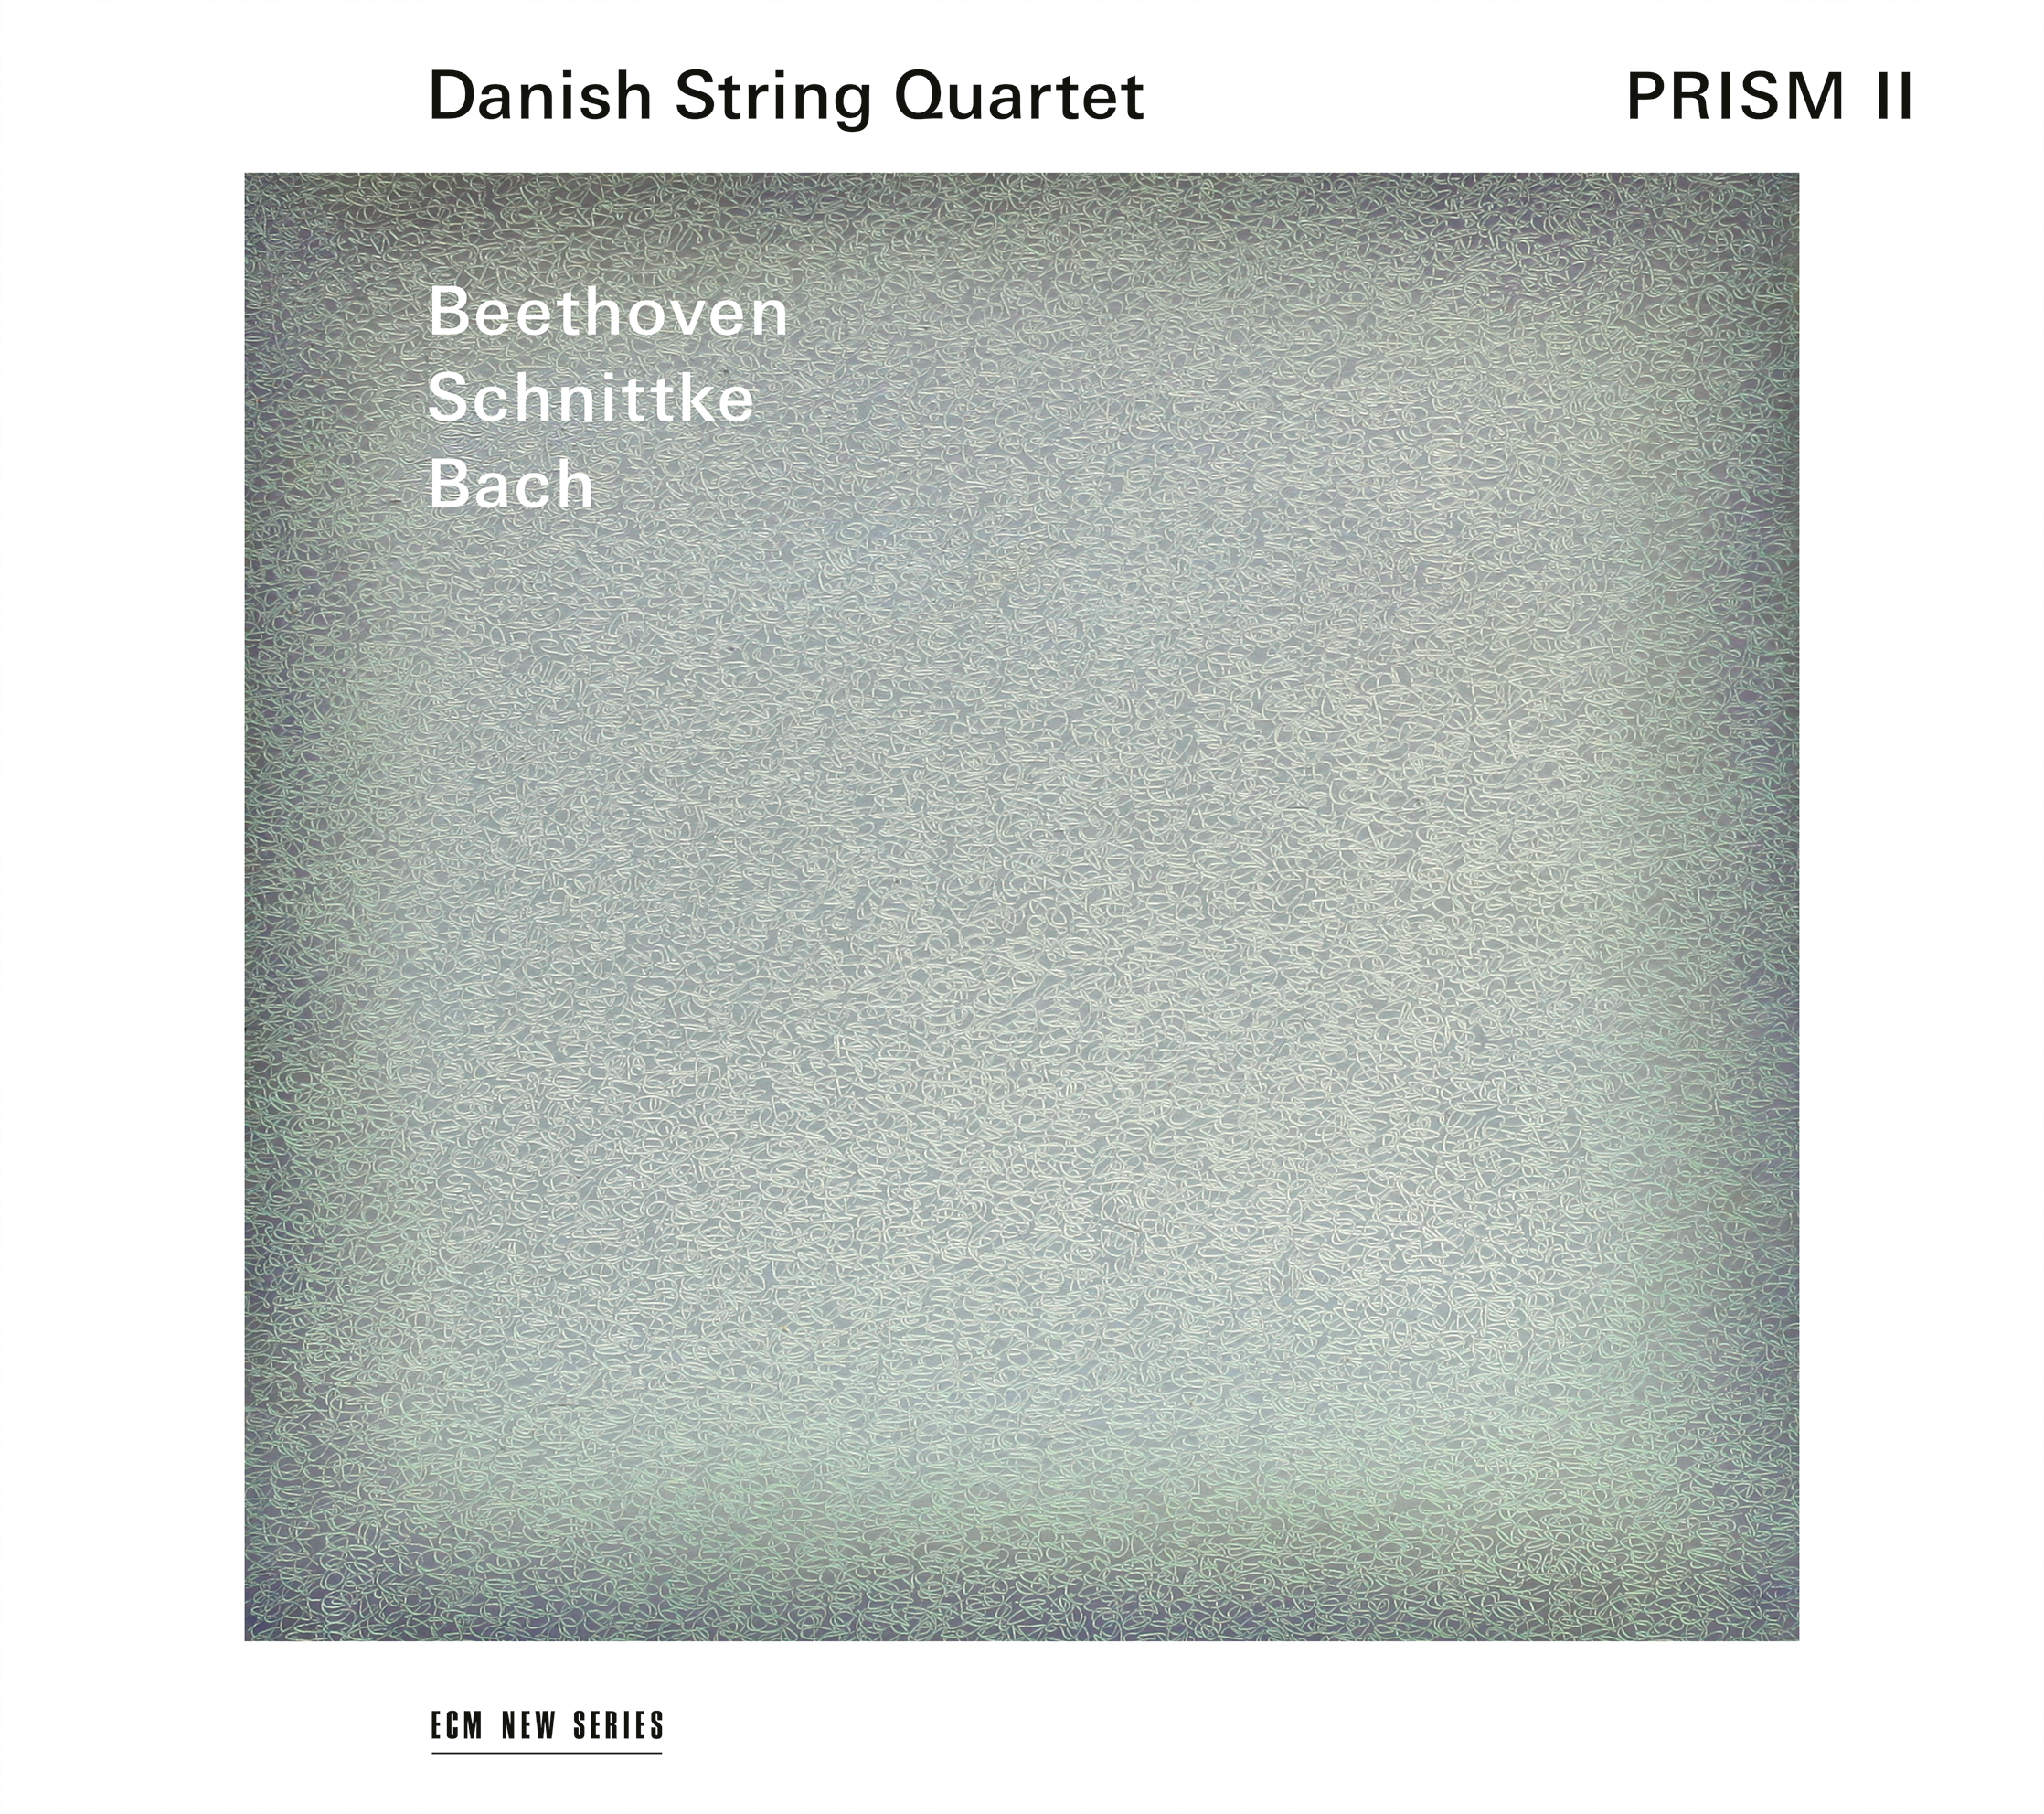 Challenge Records International - Prism II - Danish String